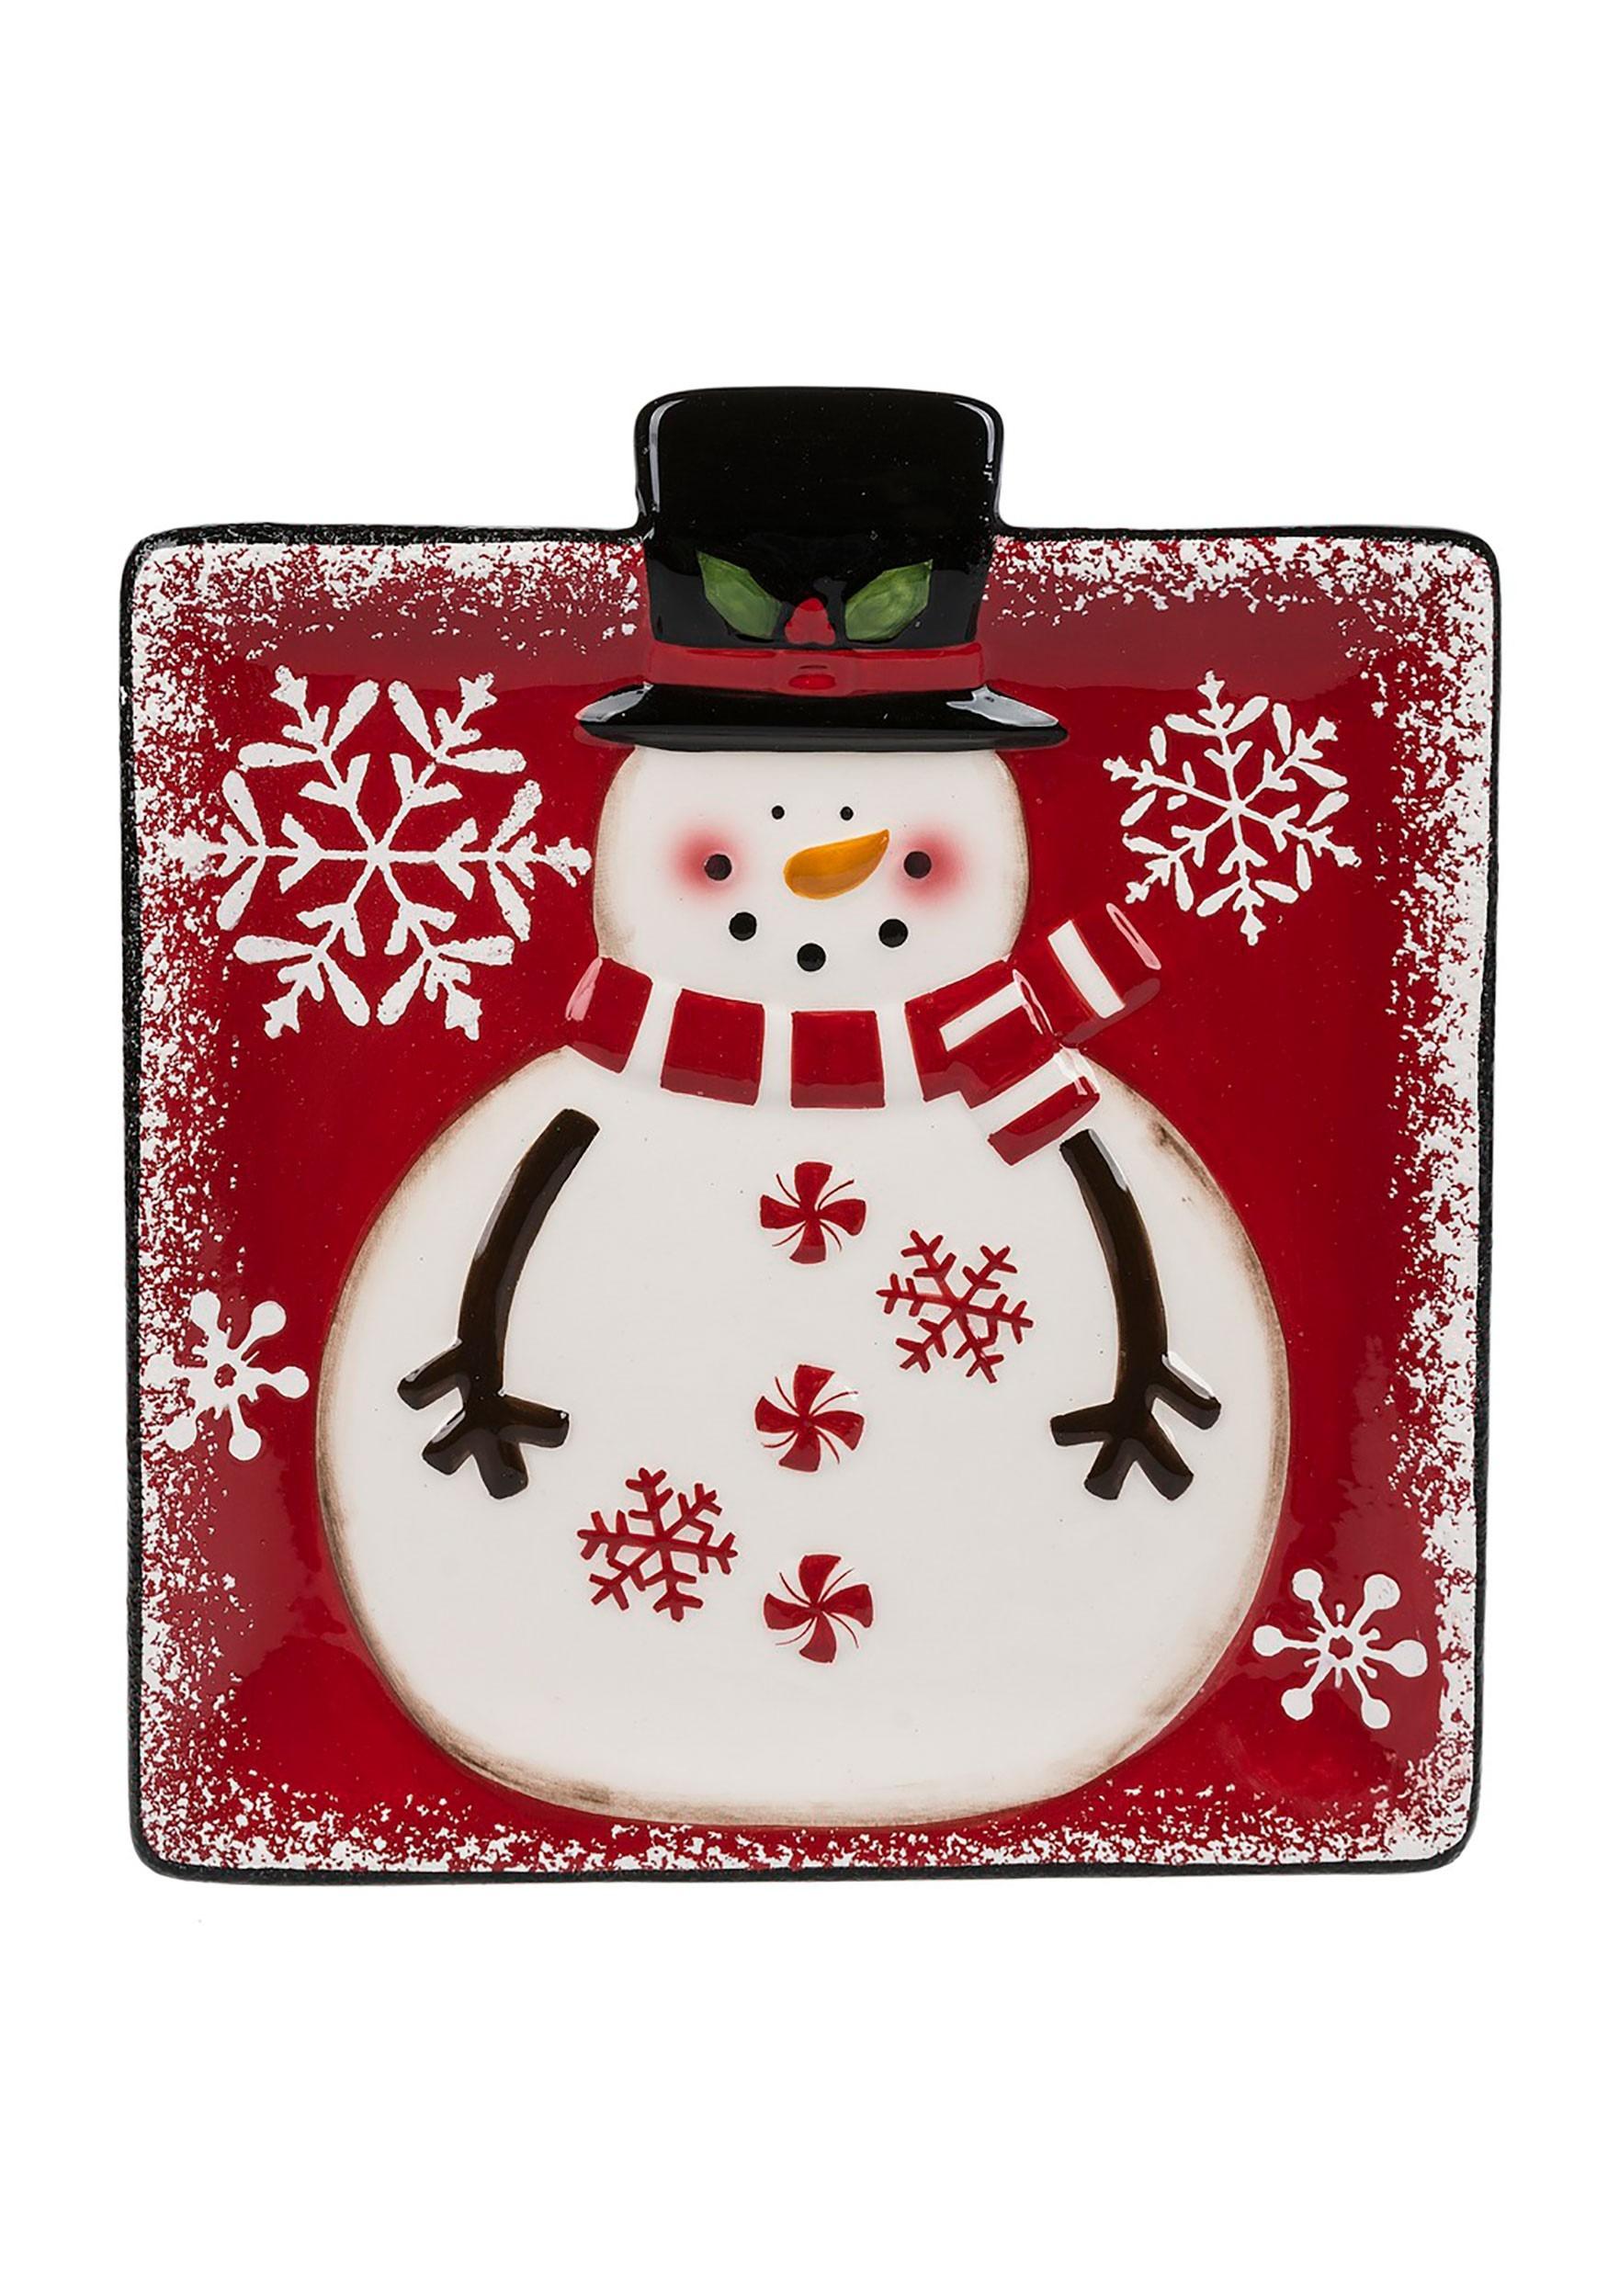 Snowman Snack Plate Dish